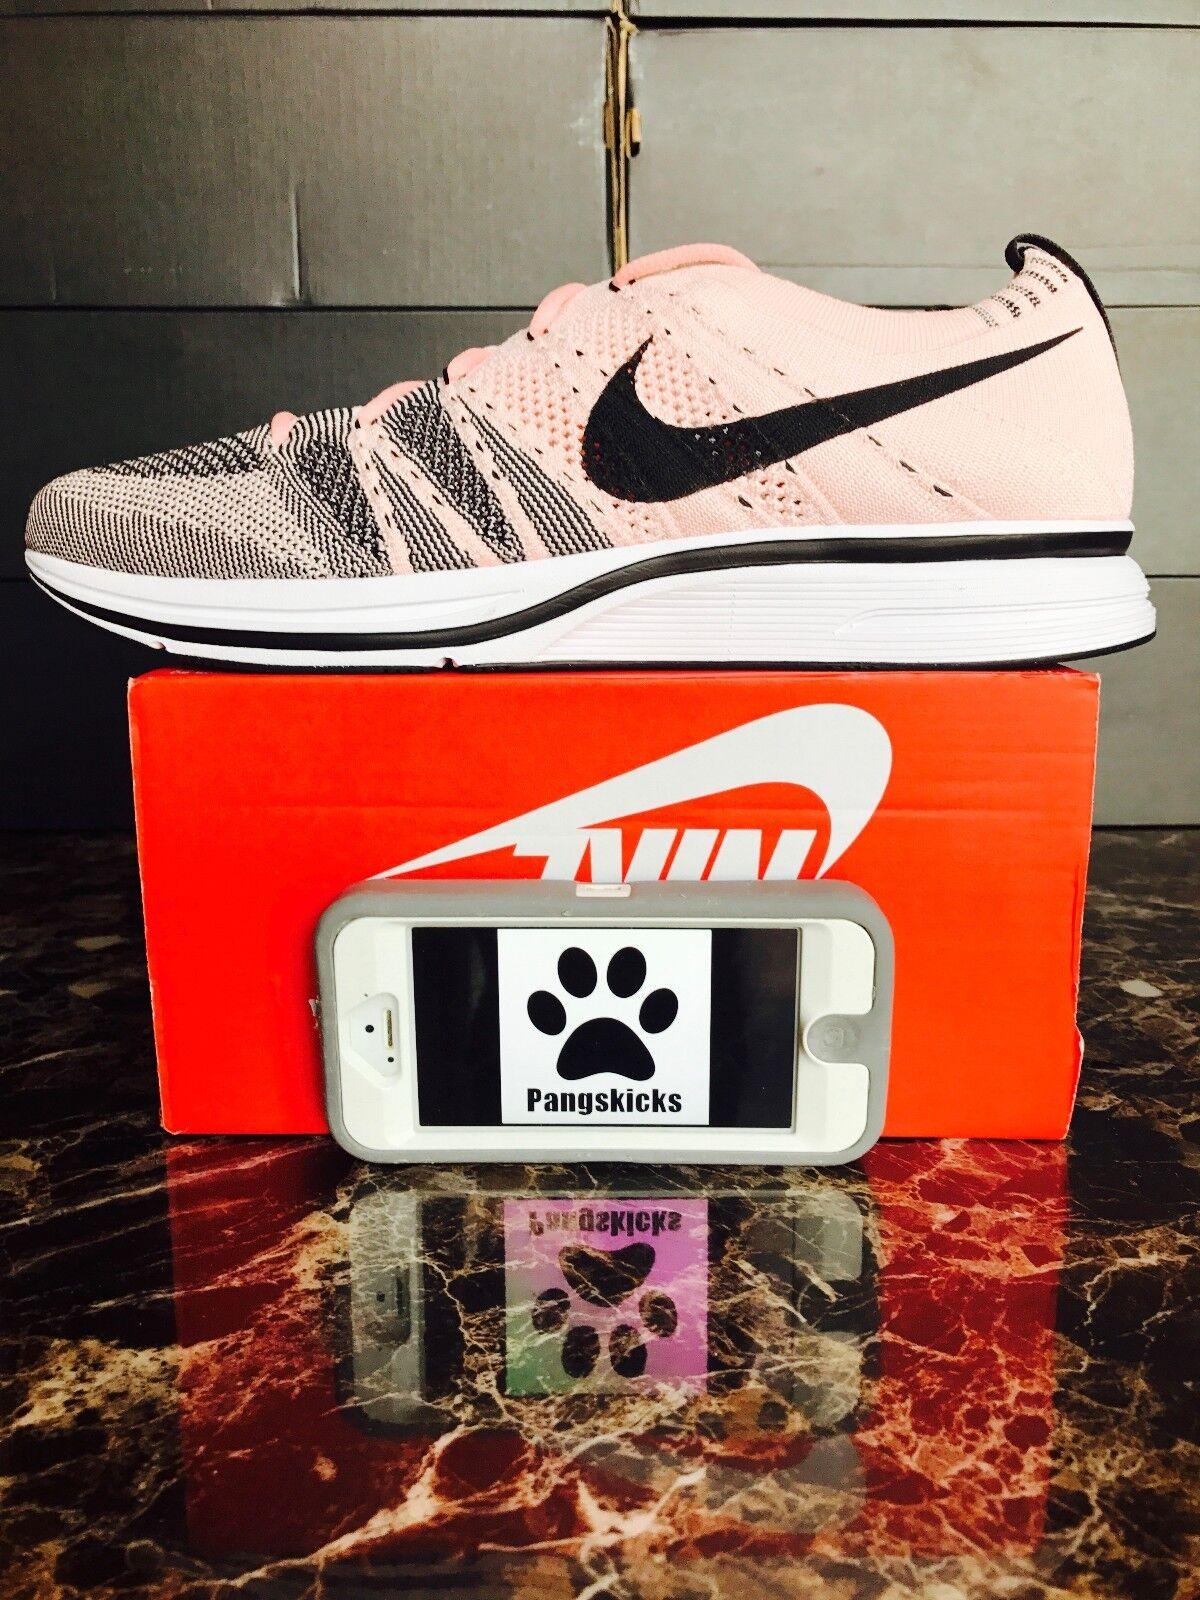 Nike Flyknit White Trainer Sunset Tint Black White Flyknit AH8396-600 Size 13 4617fd